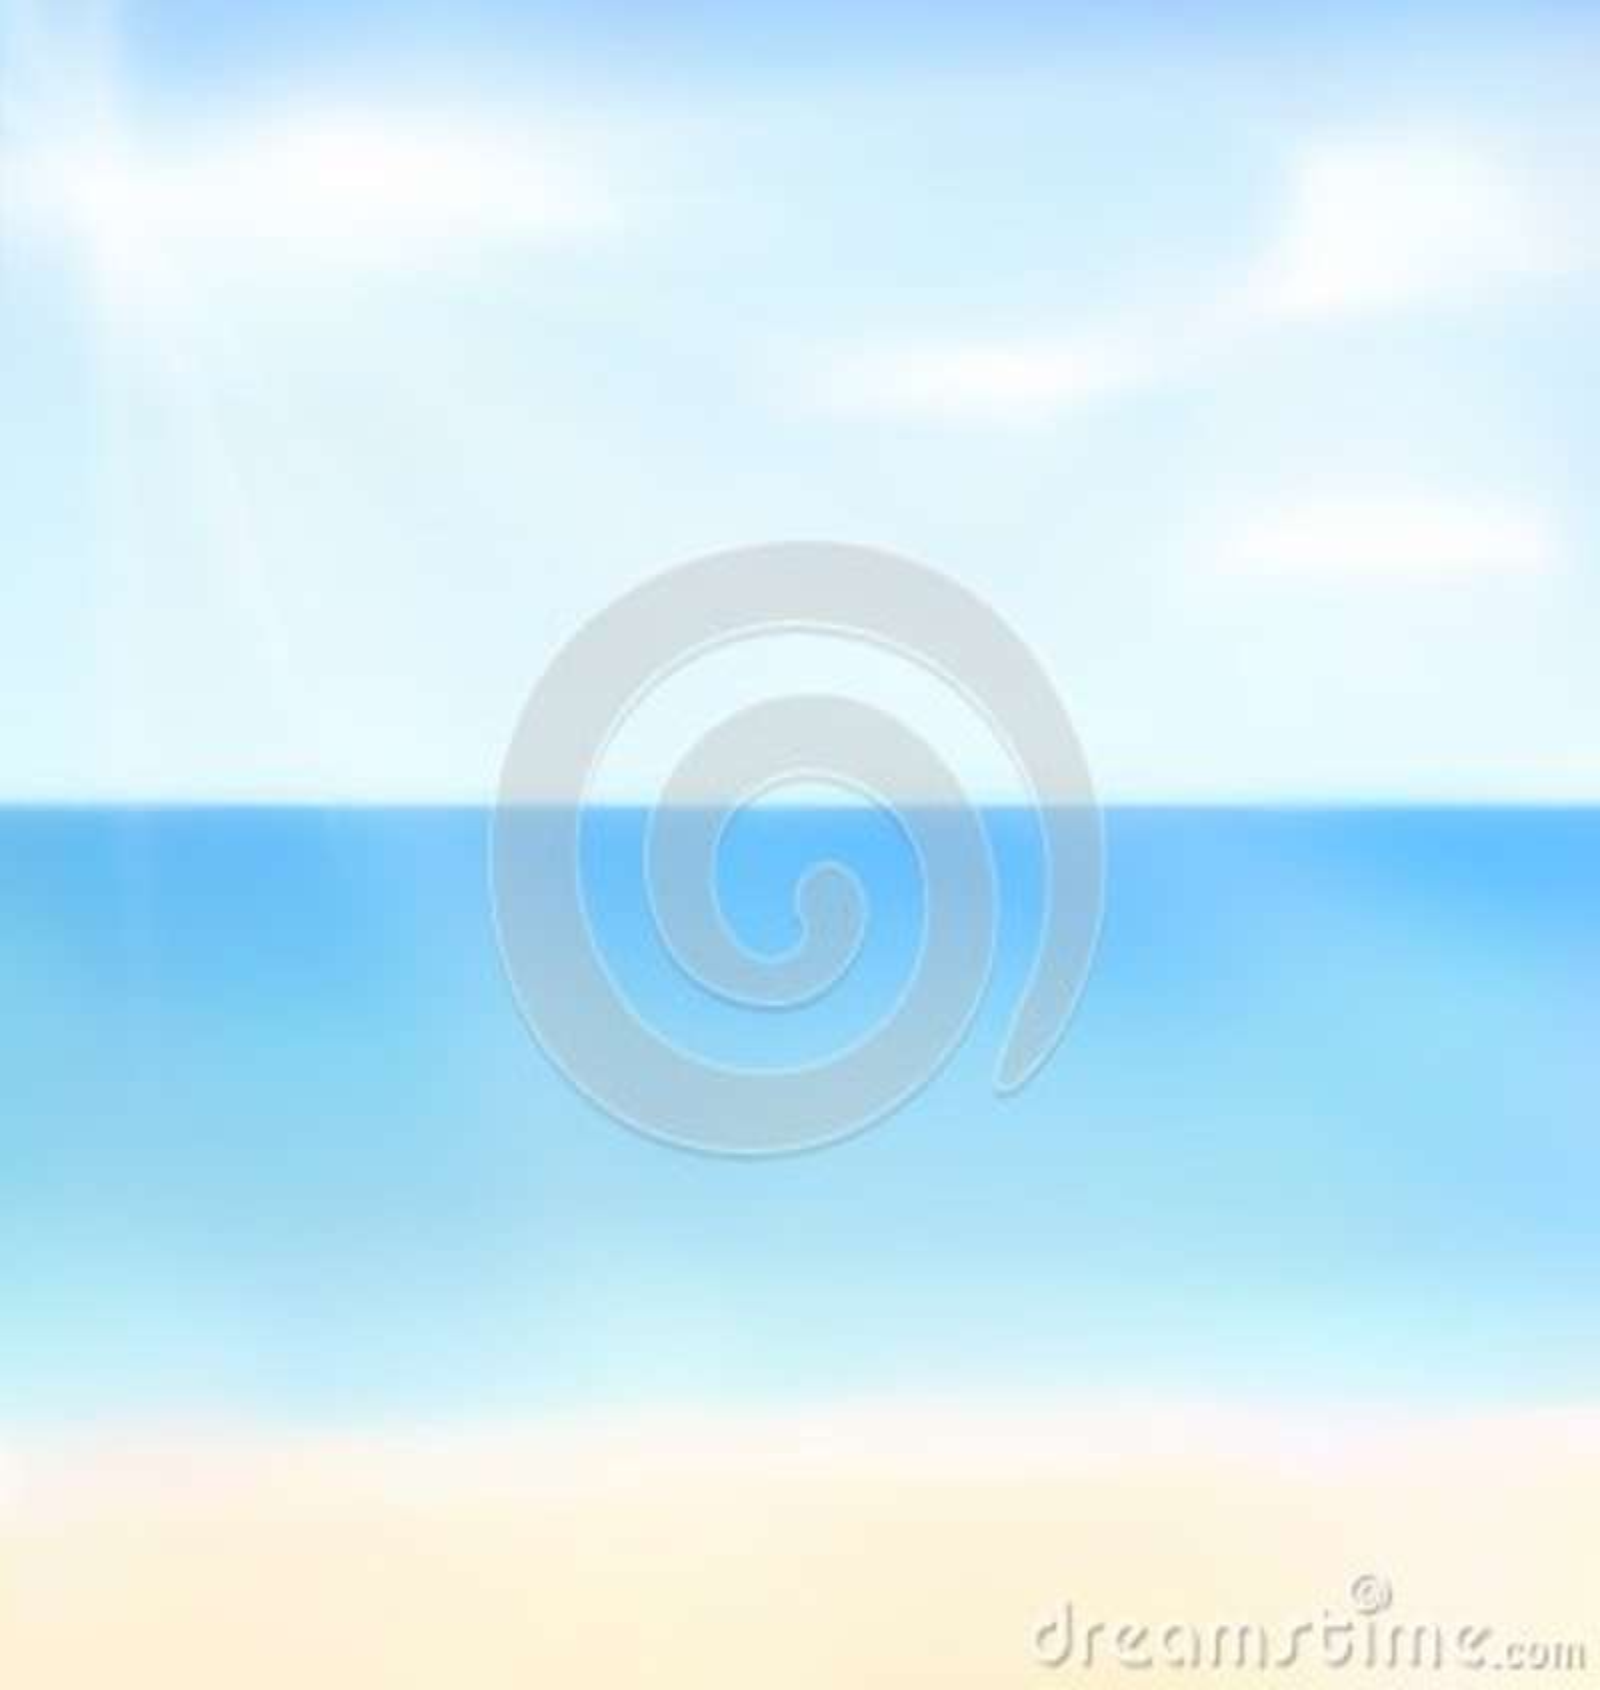 Illustration of beautiful summer background